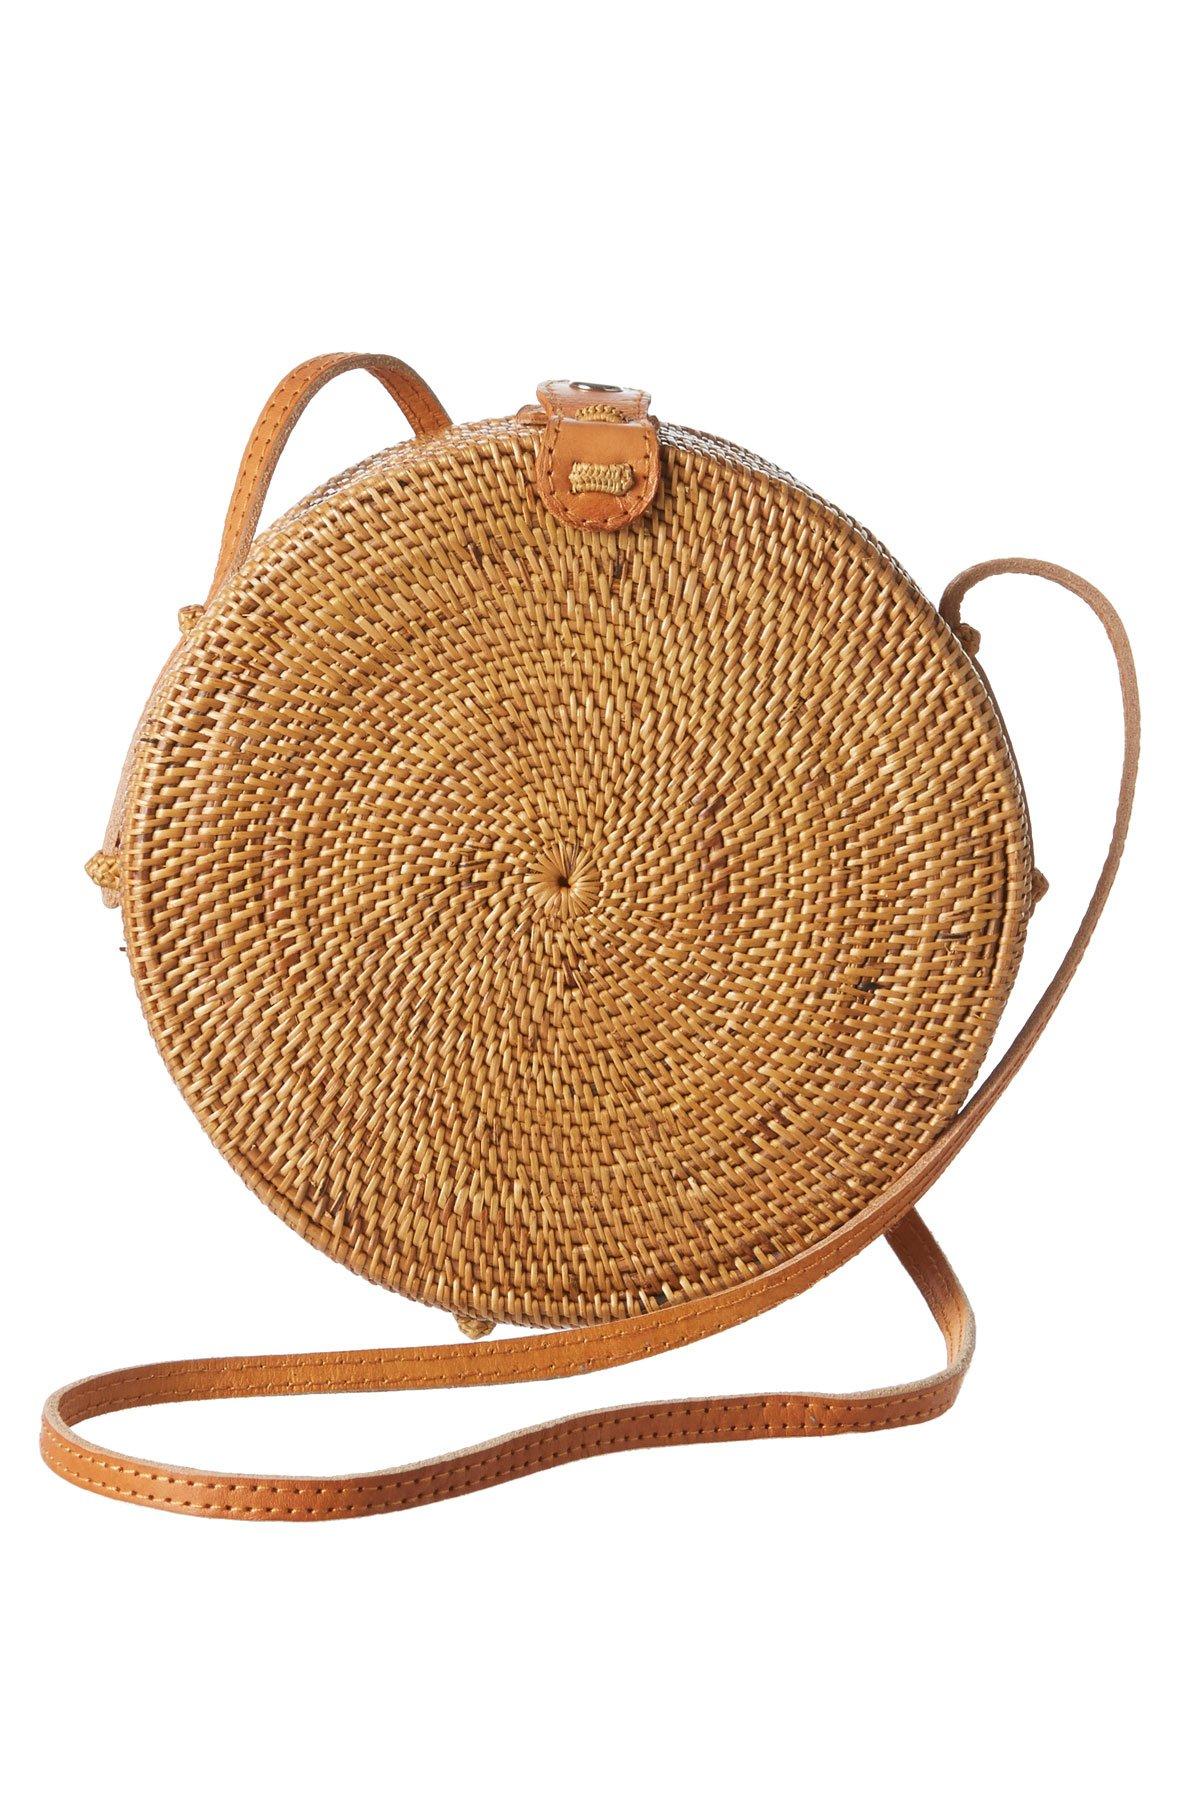 Faithfull the Brand Jana Handmade Round Handbag Natural One